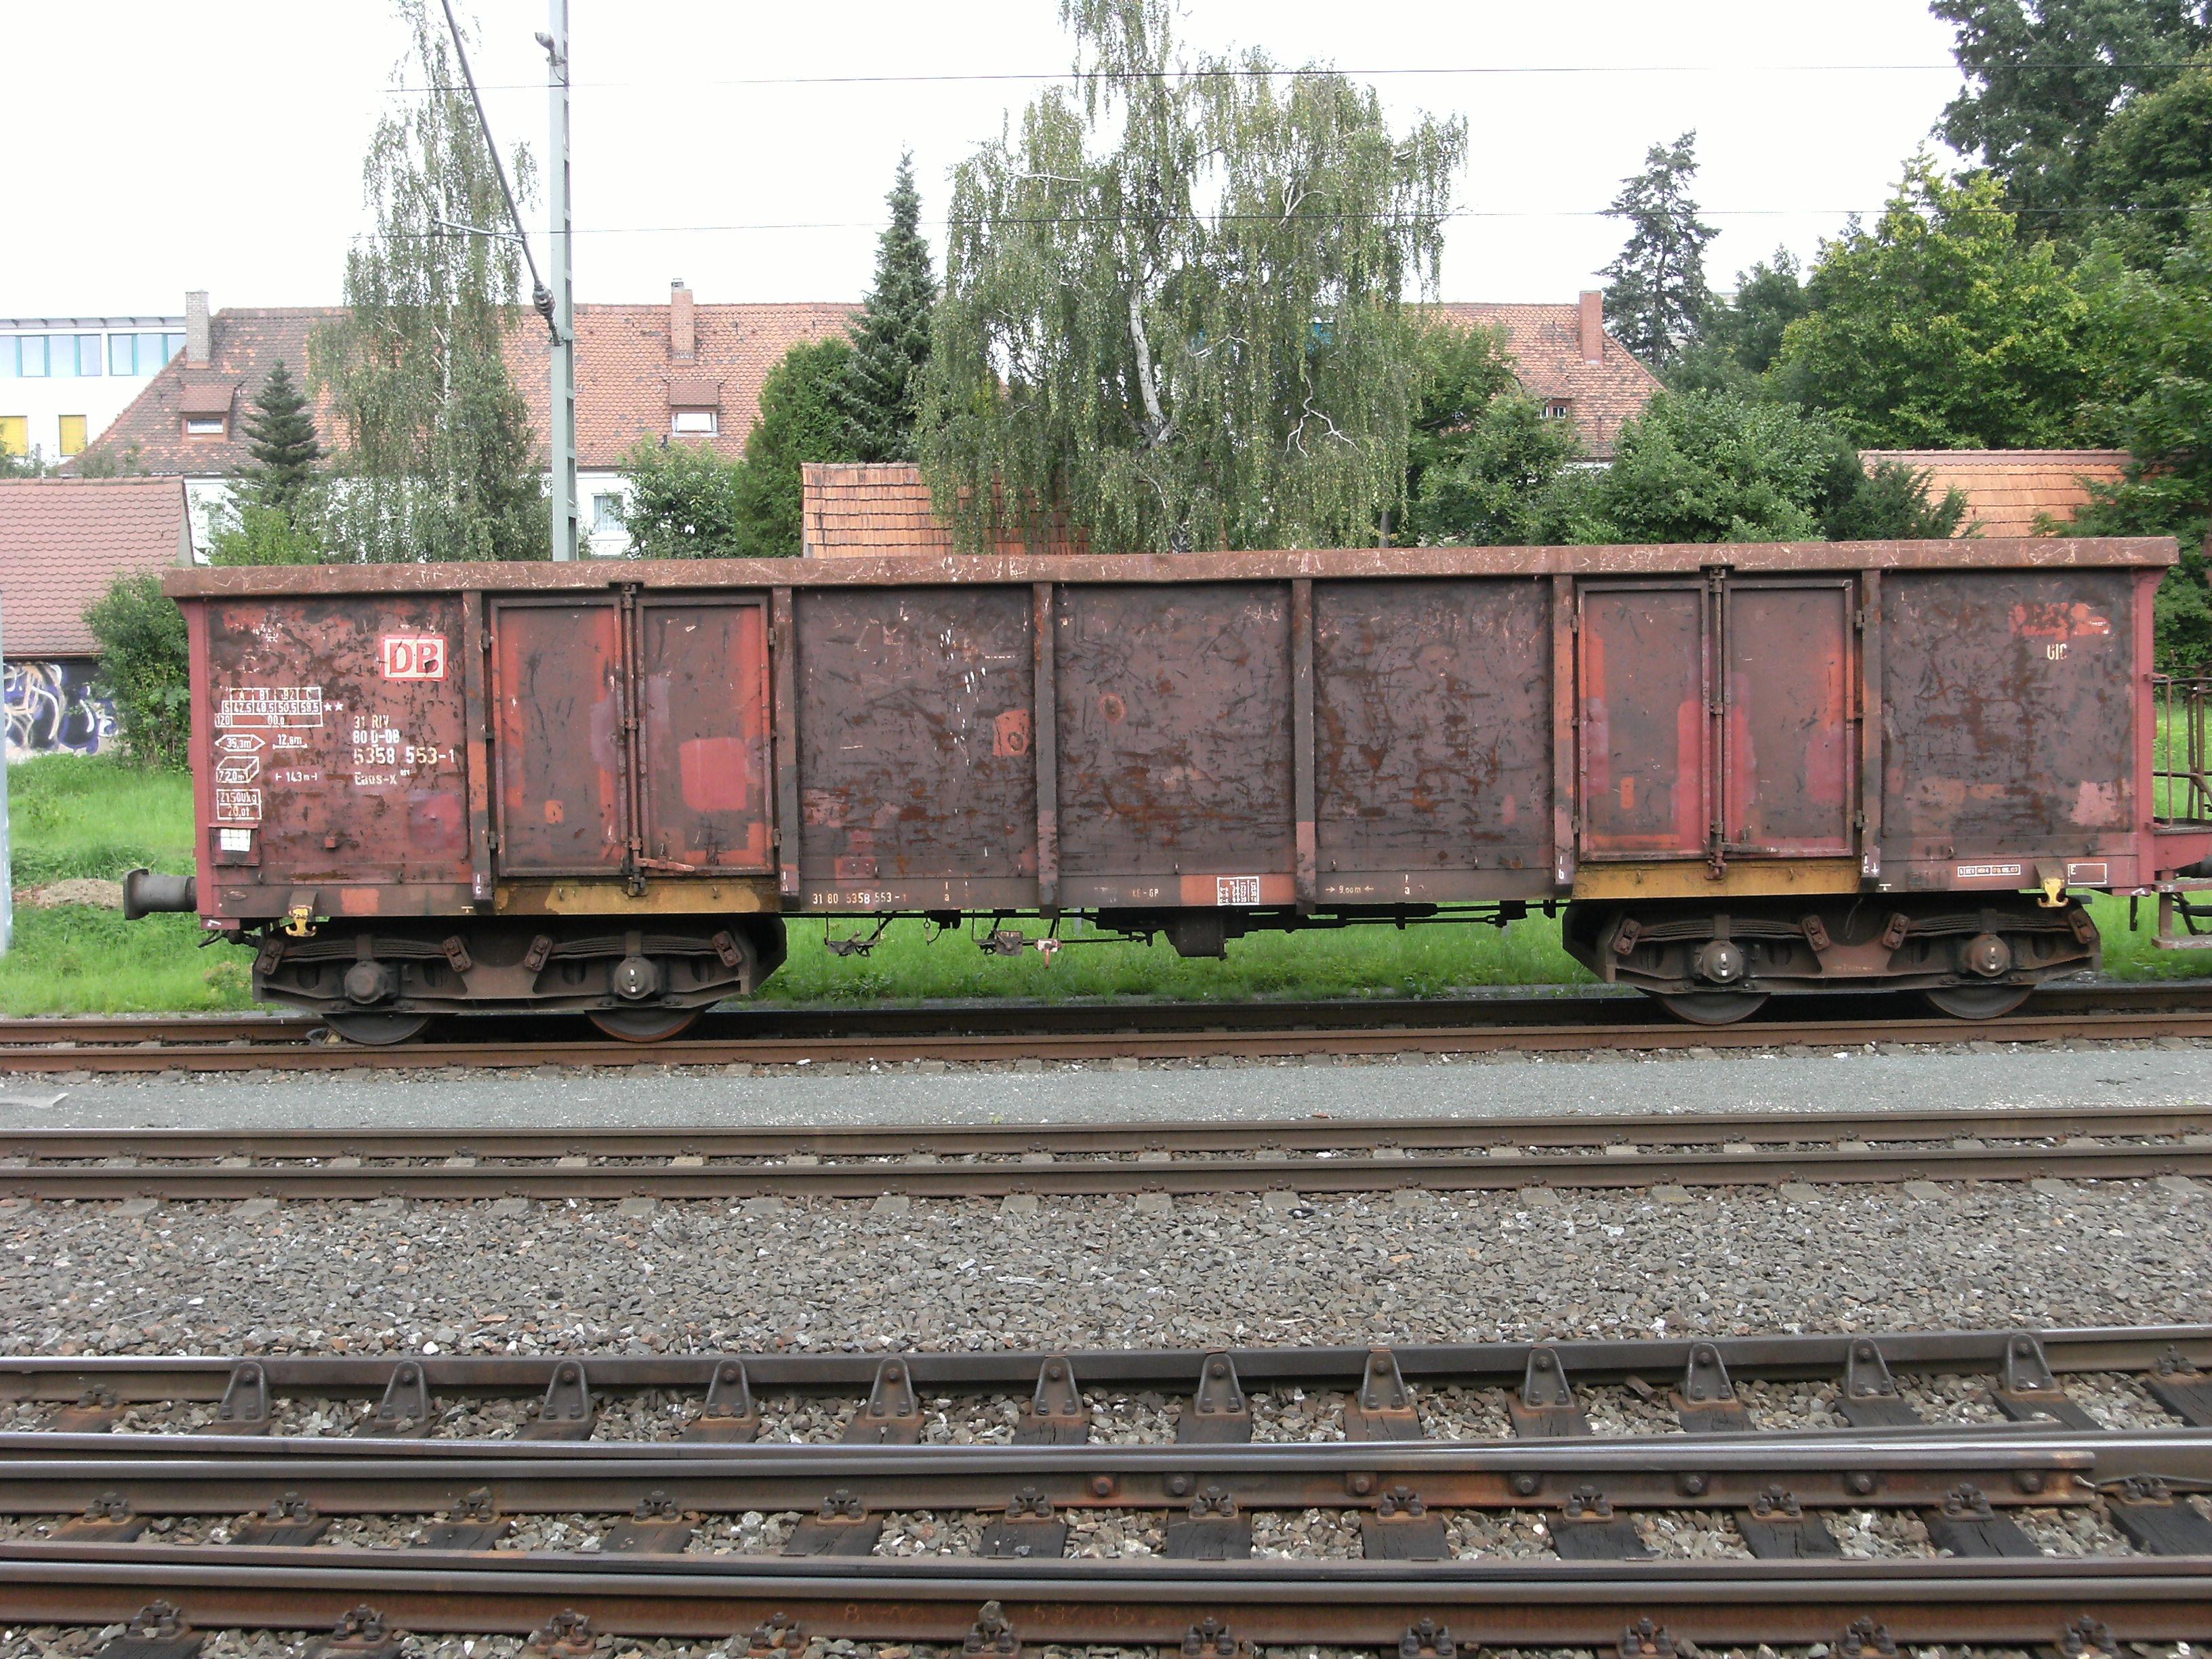 Coloriage wagon et dessin imprimer - Dessin train et wagon ...